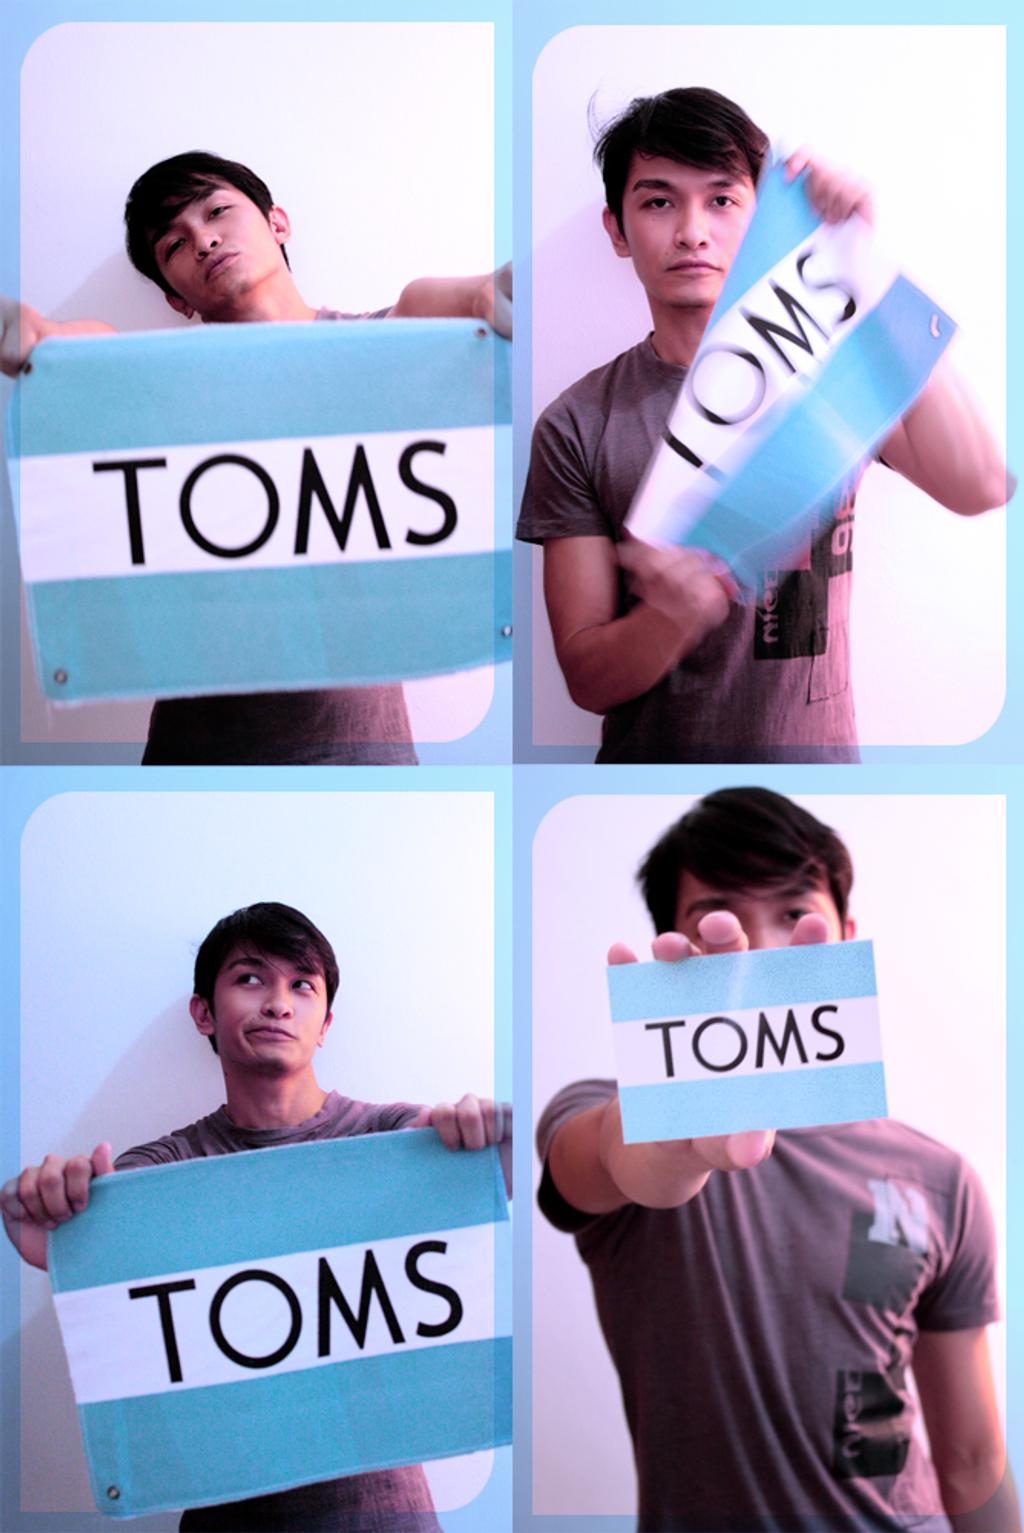 TOMS by gavincci